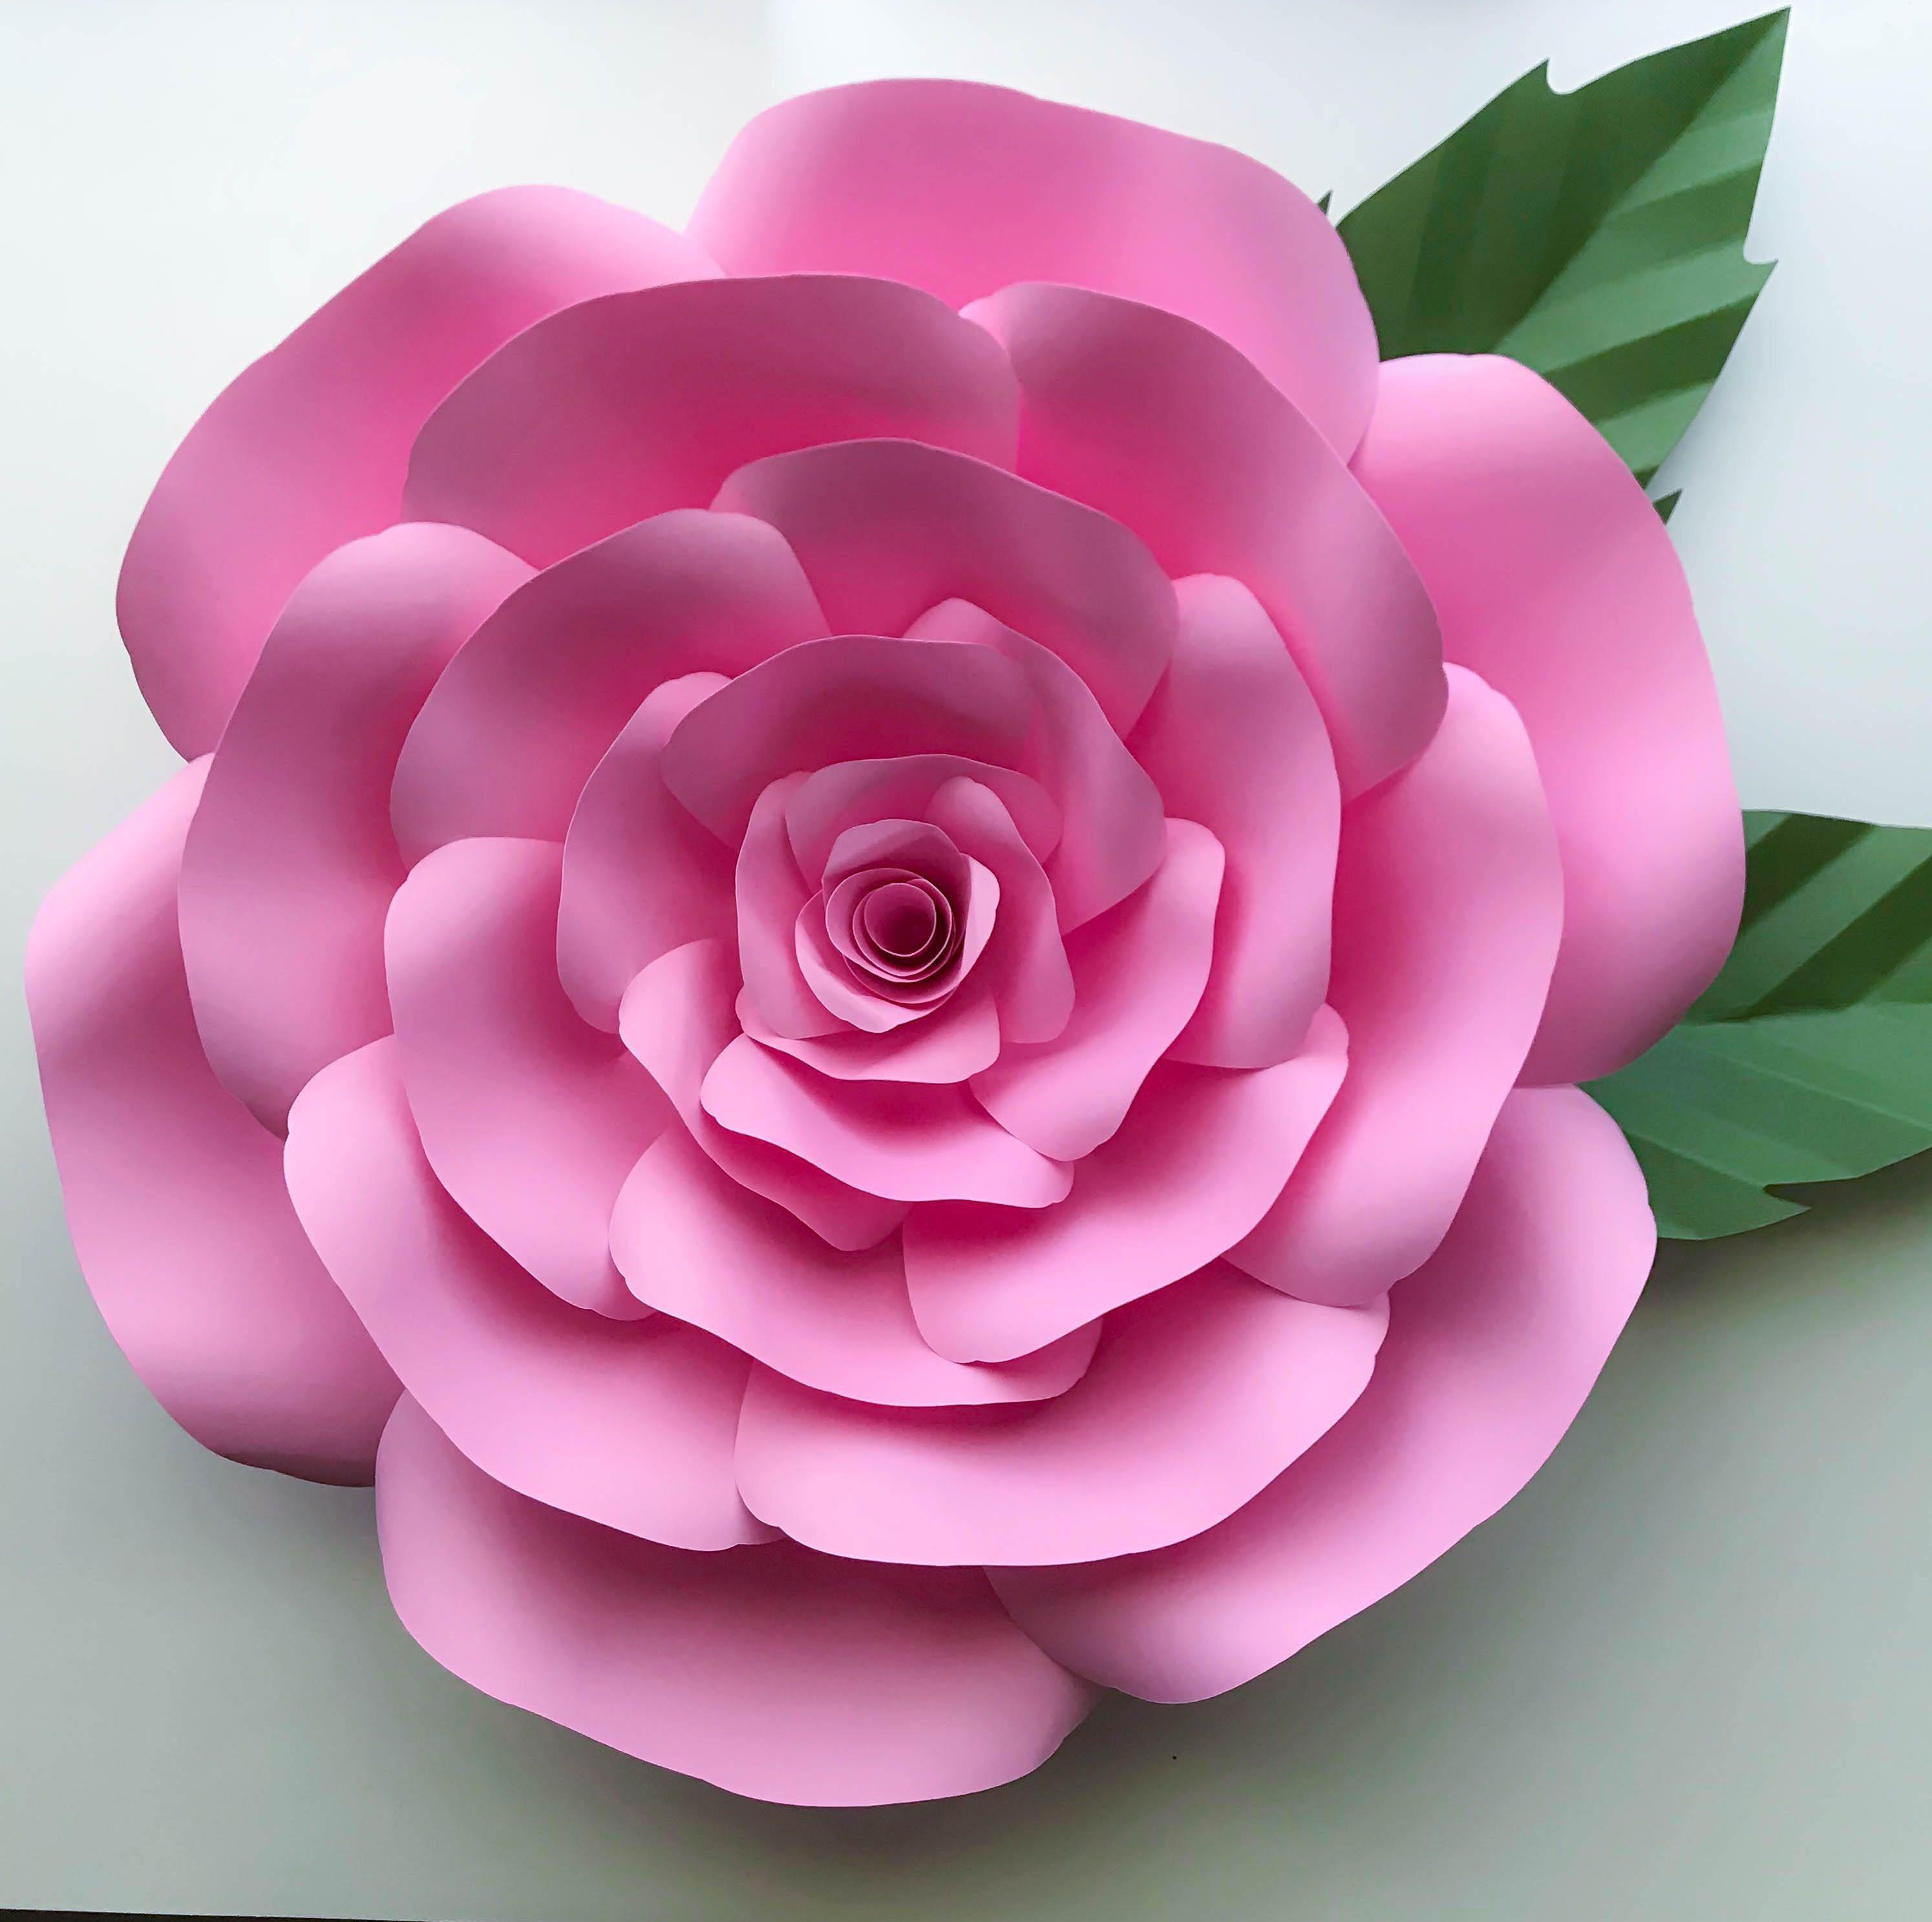 001 Astounding Paper Rose Template Pdf High Def  Flower Giant Free CrepeFull